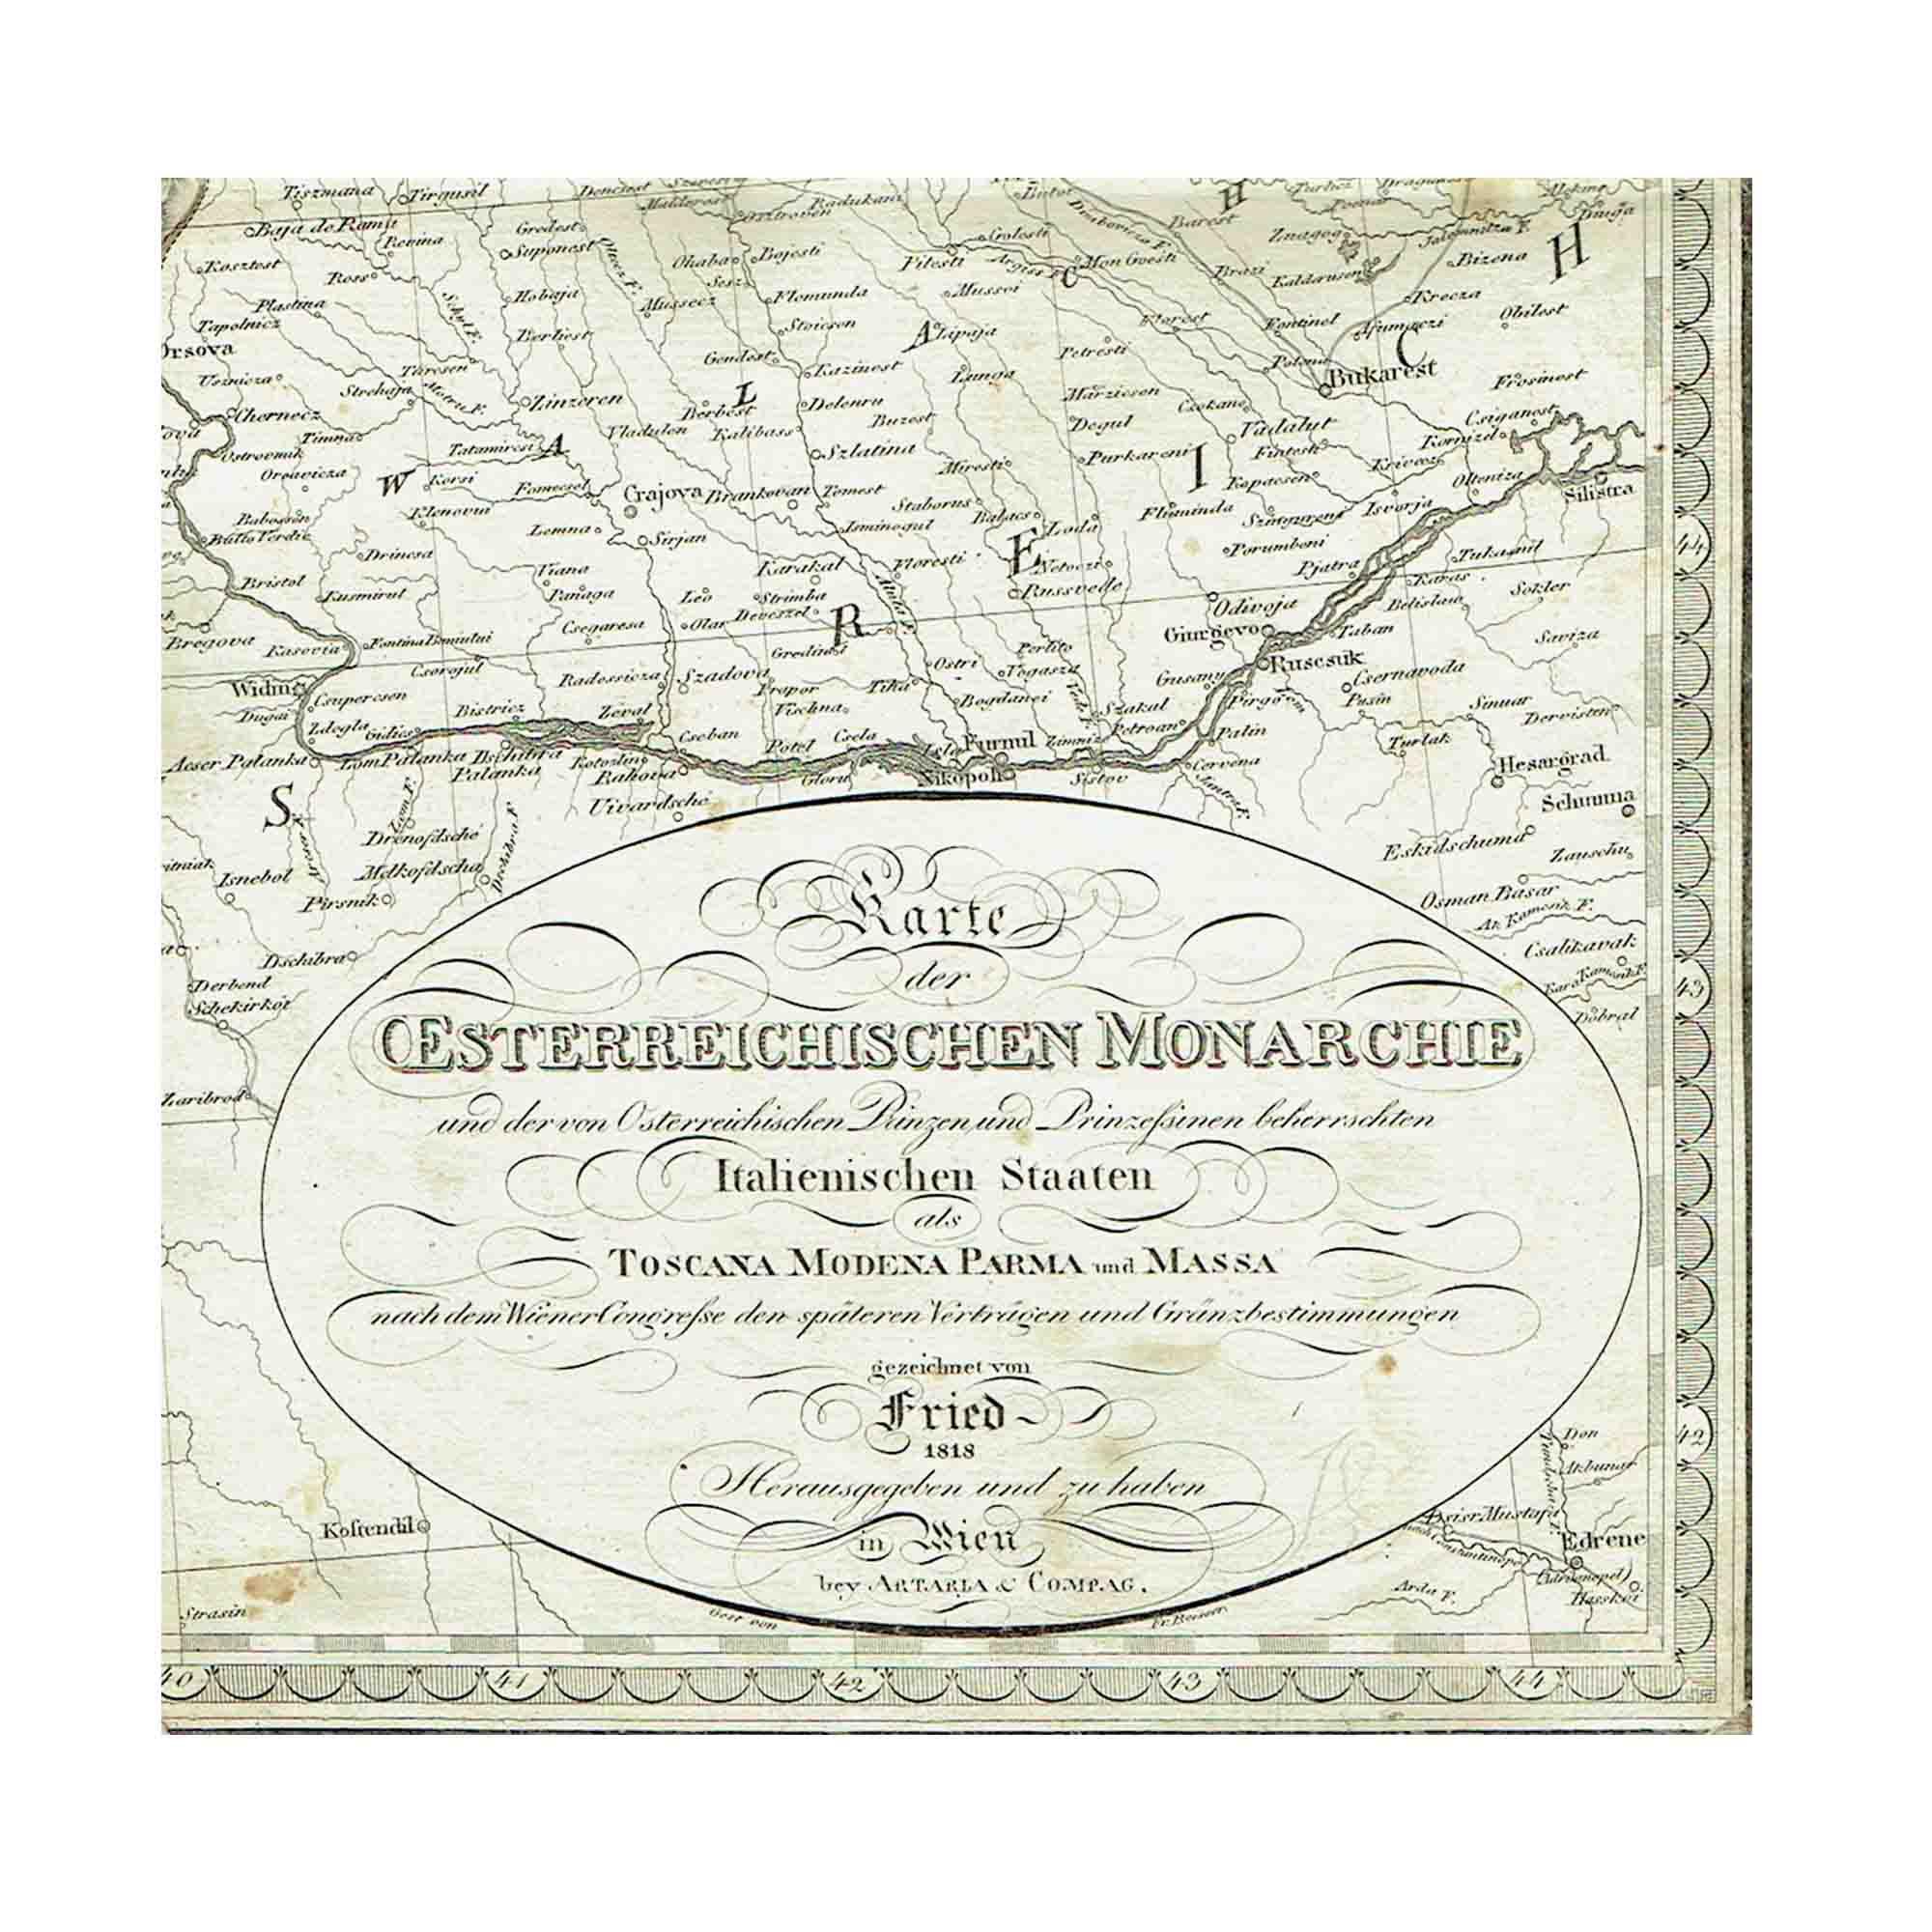 5404-Fried-Oesterr-Monarchie-1818-2-A-N.jpg